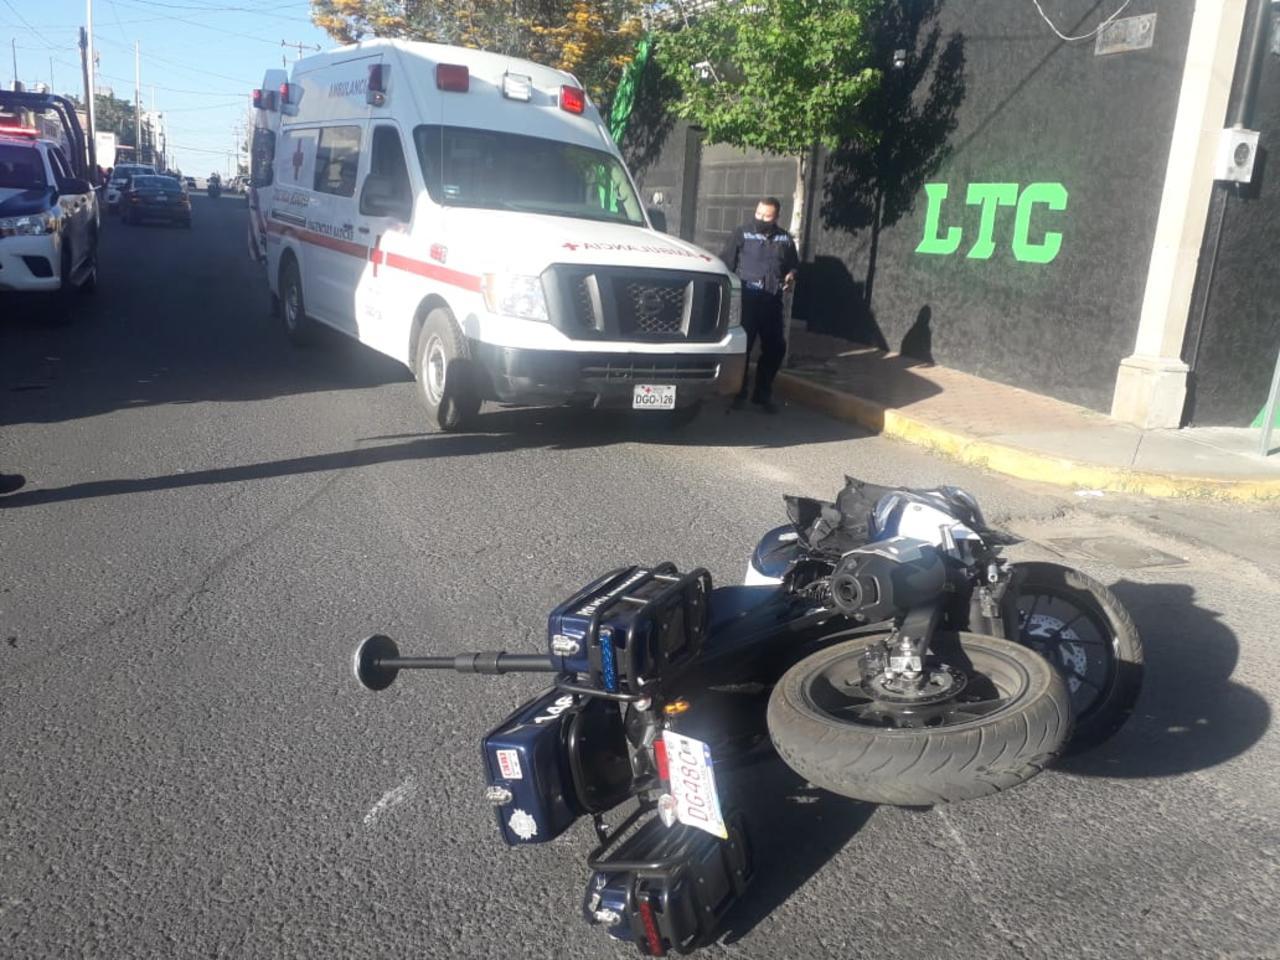 Policía motorizado se impacta contra vehículo